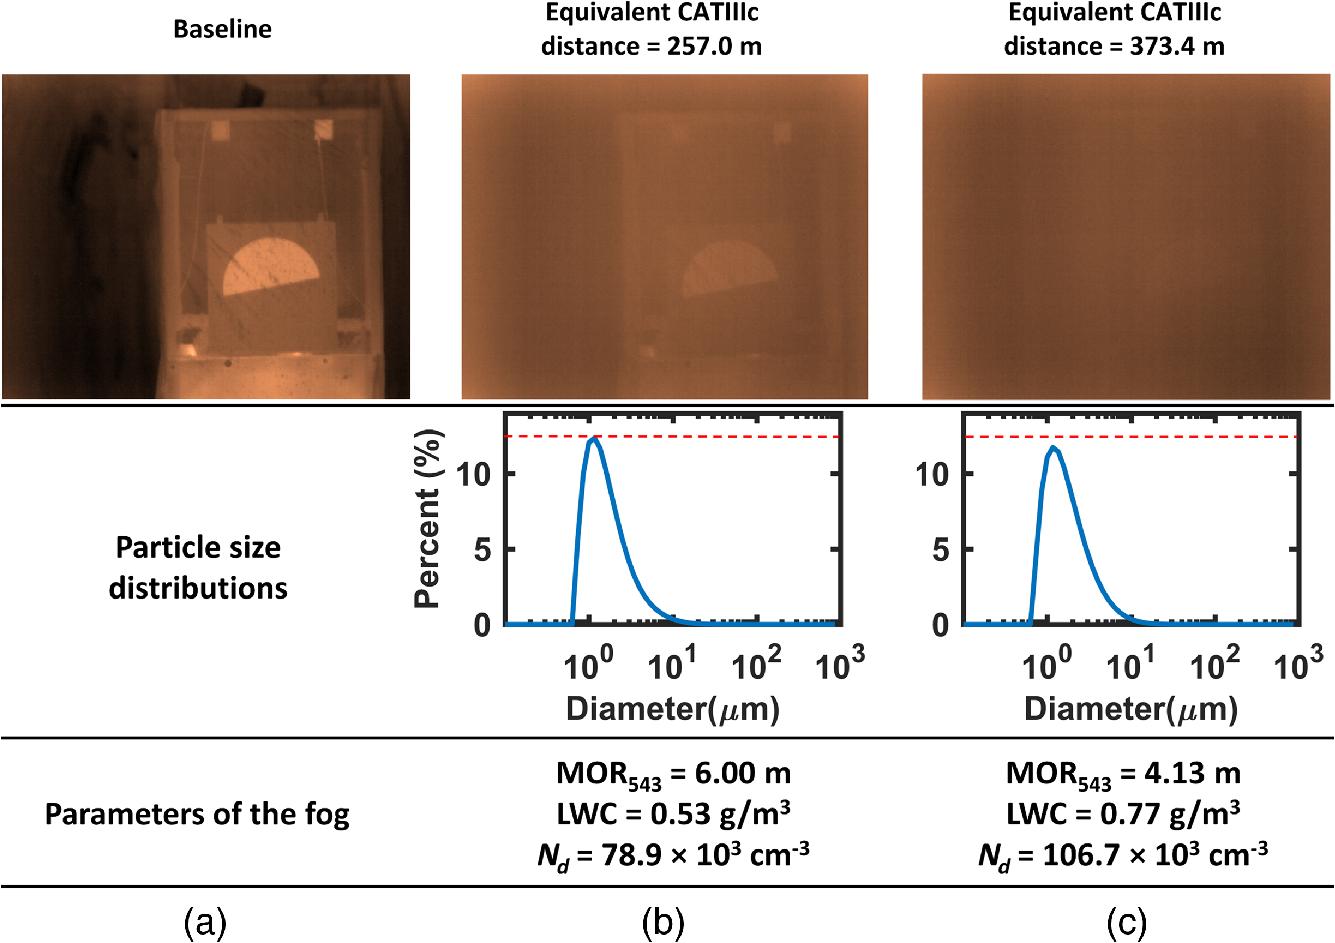 Measuring resolution degradation of long-wavelength infrared imagery